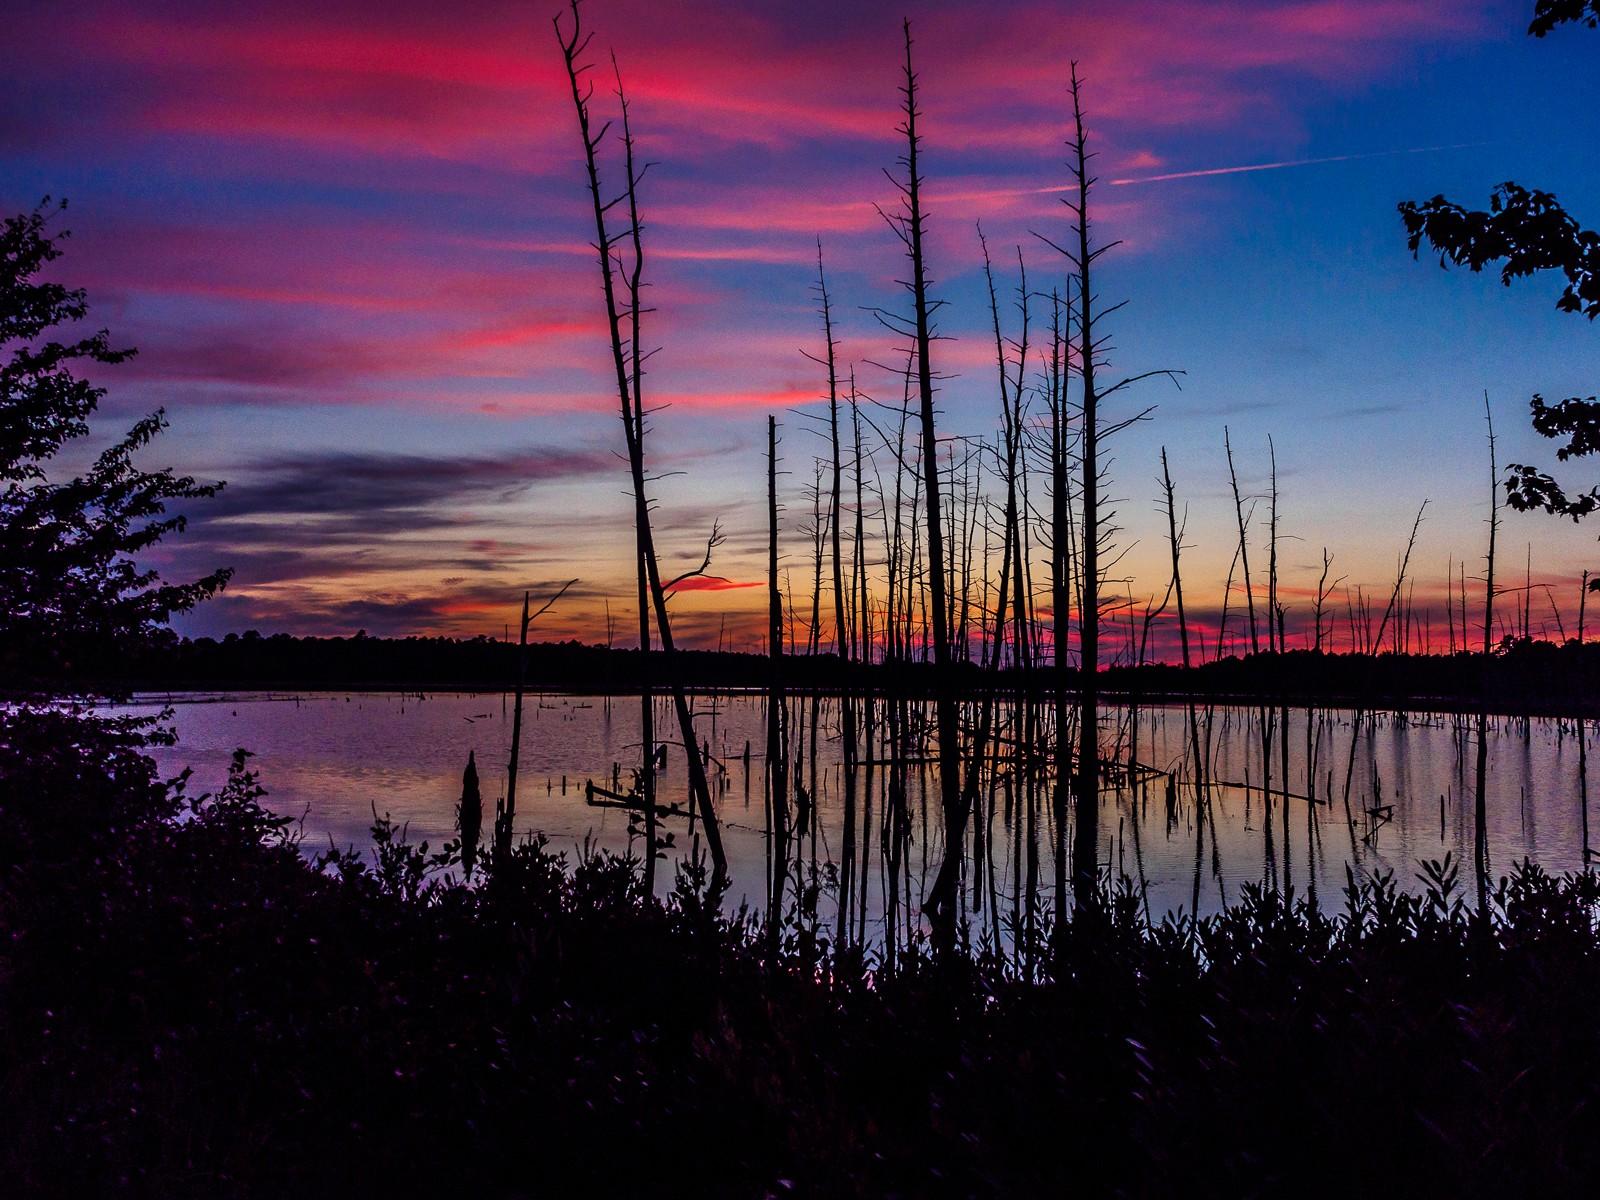 sunset-6641